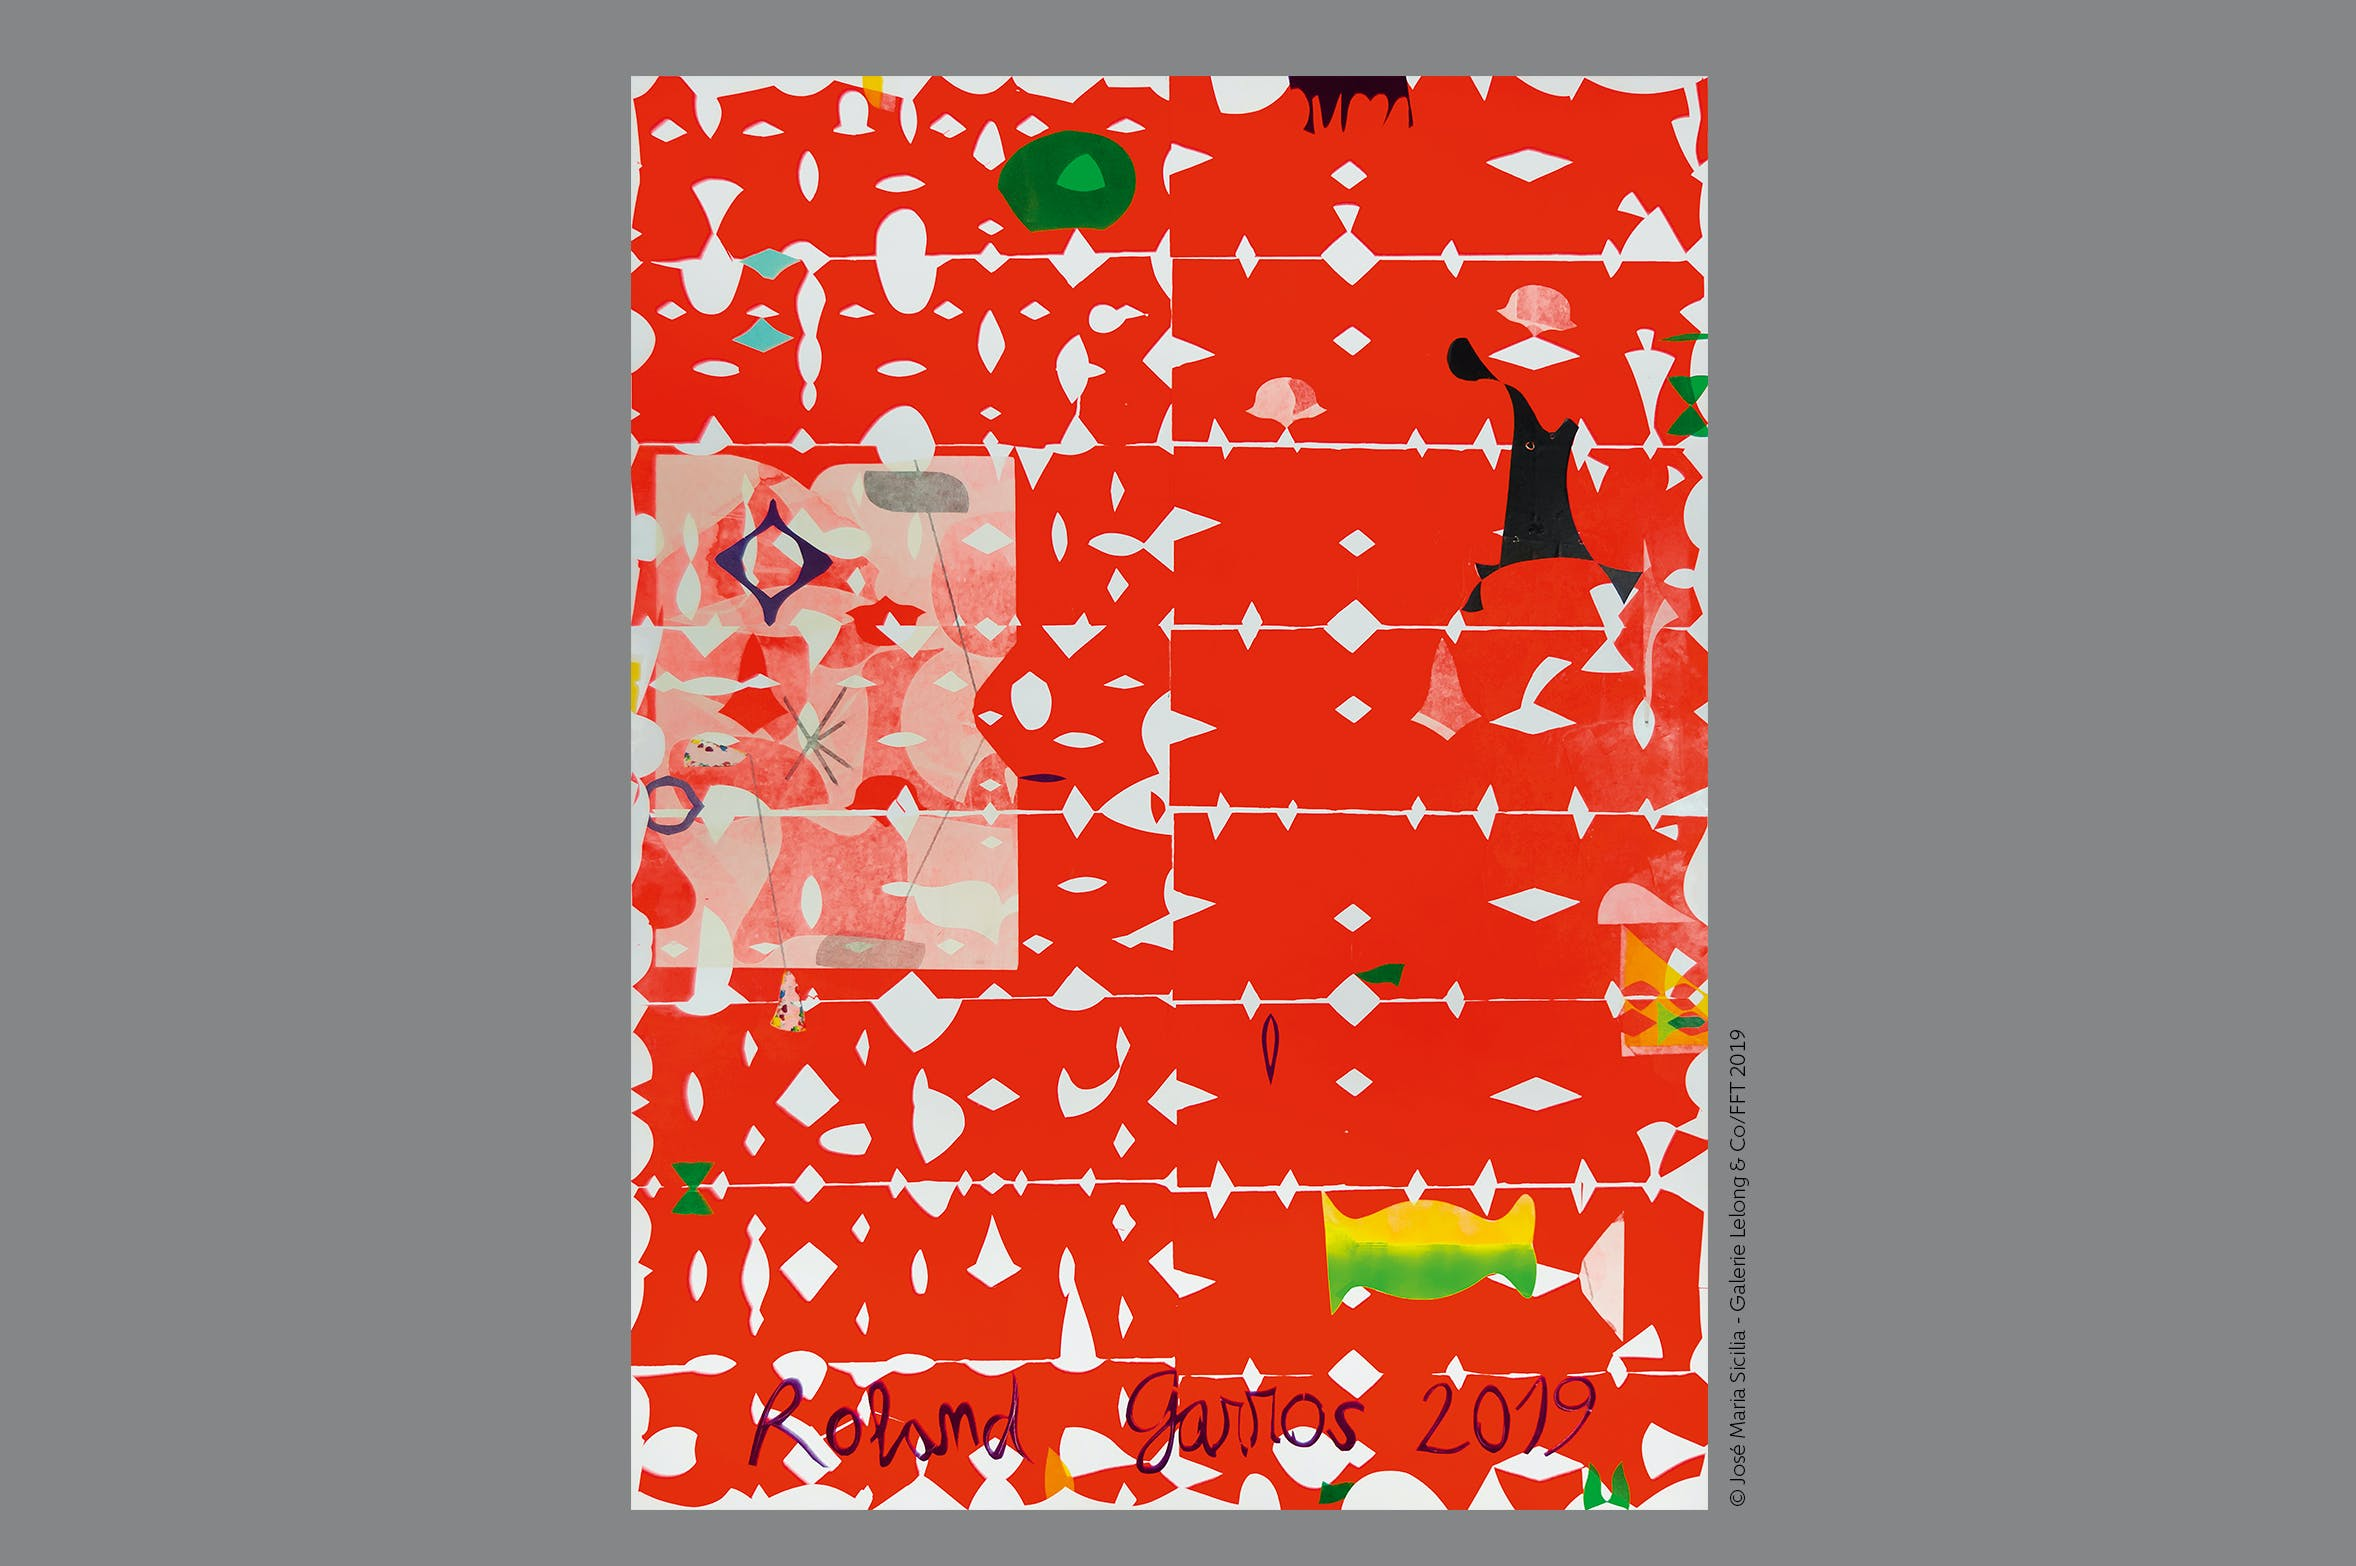 Affiche Roland-Garros 2019 / Poster Jose Maria Sicilia